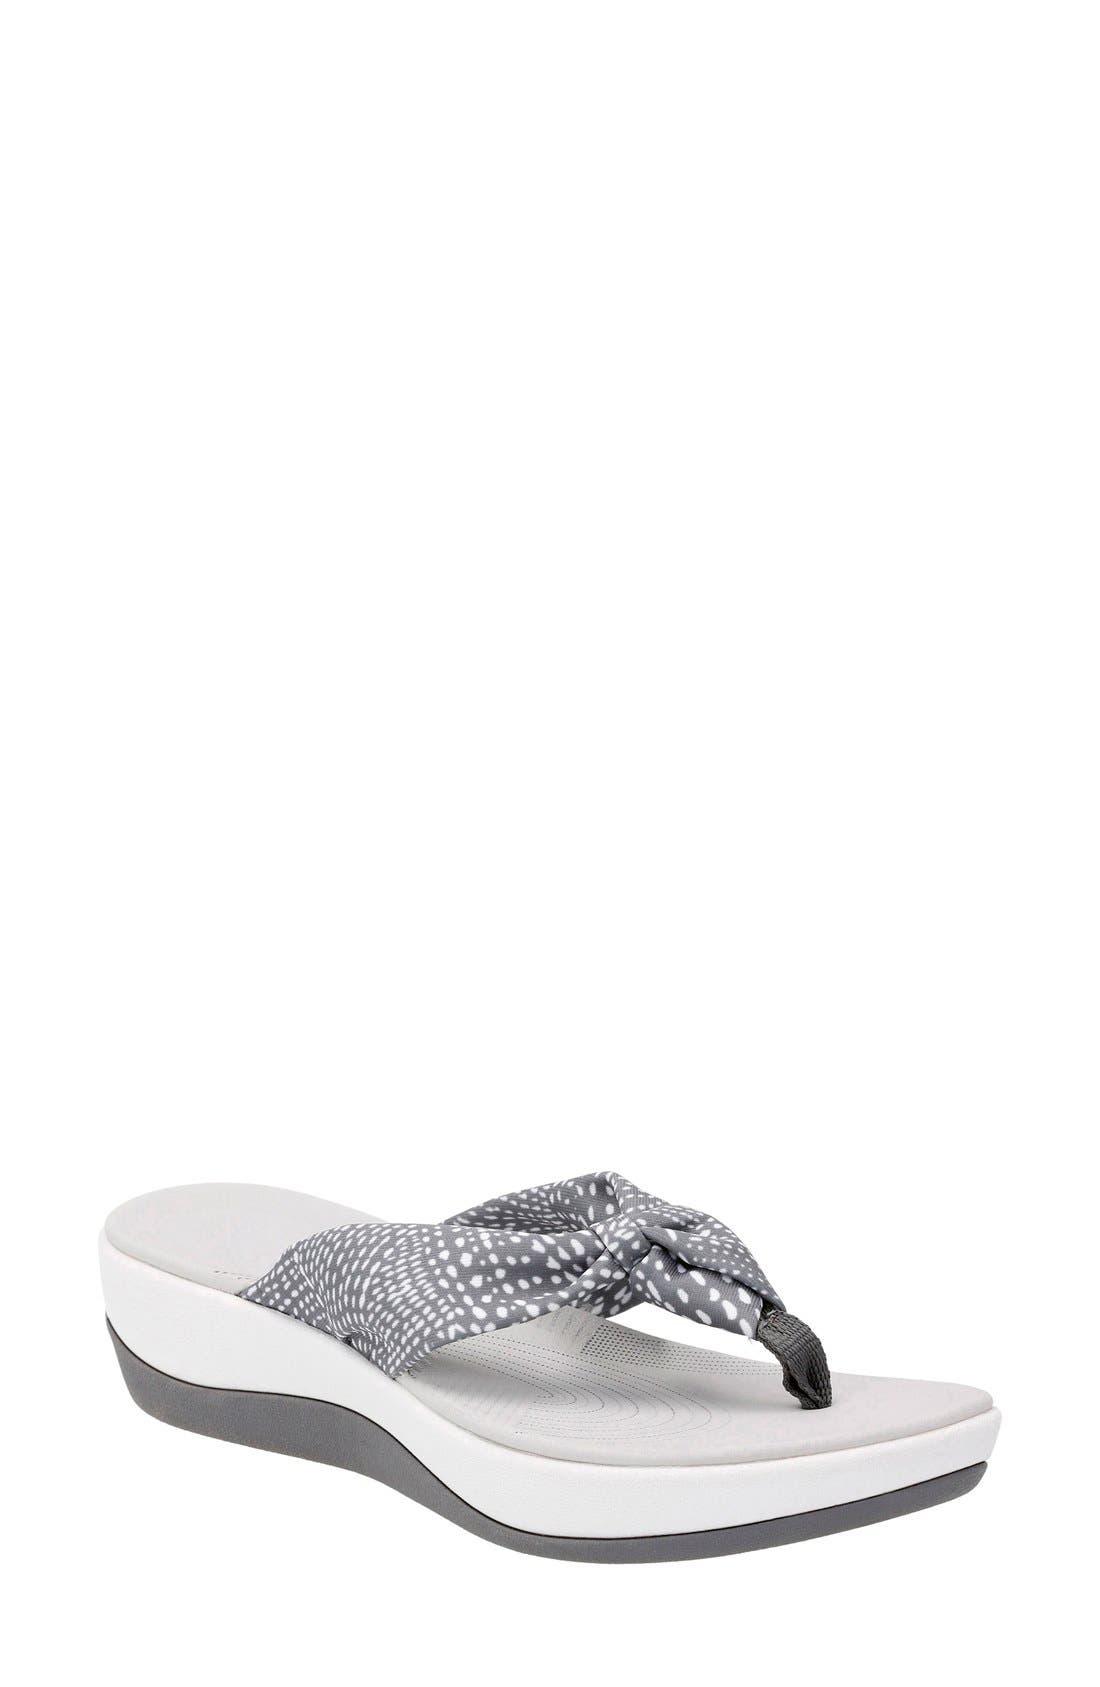 Main Image - Clarks® Arla Glison Flip Flop (Women)